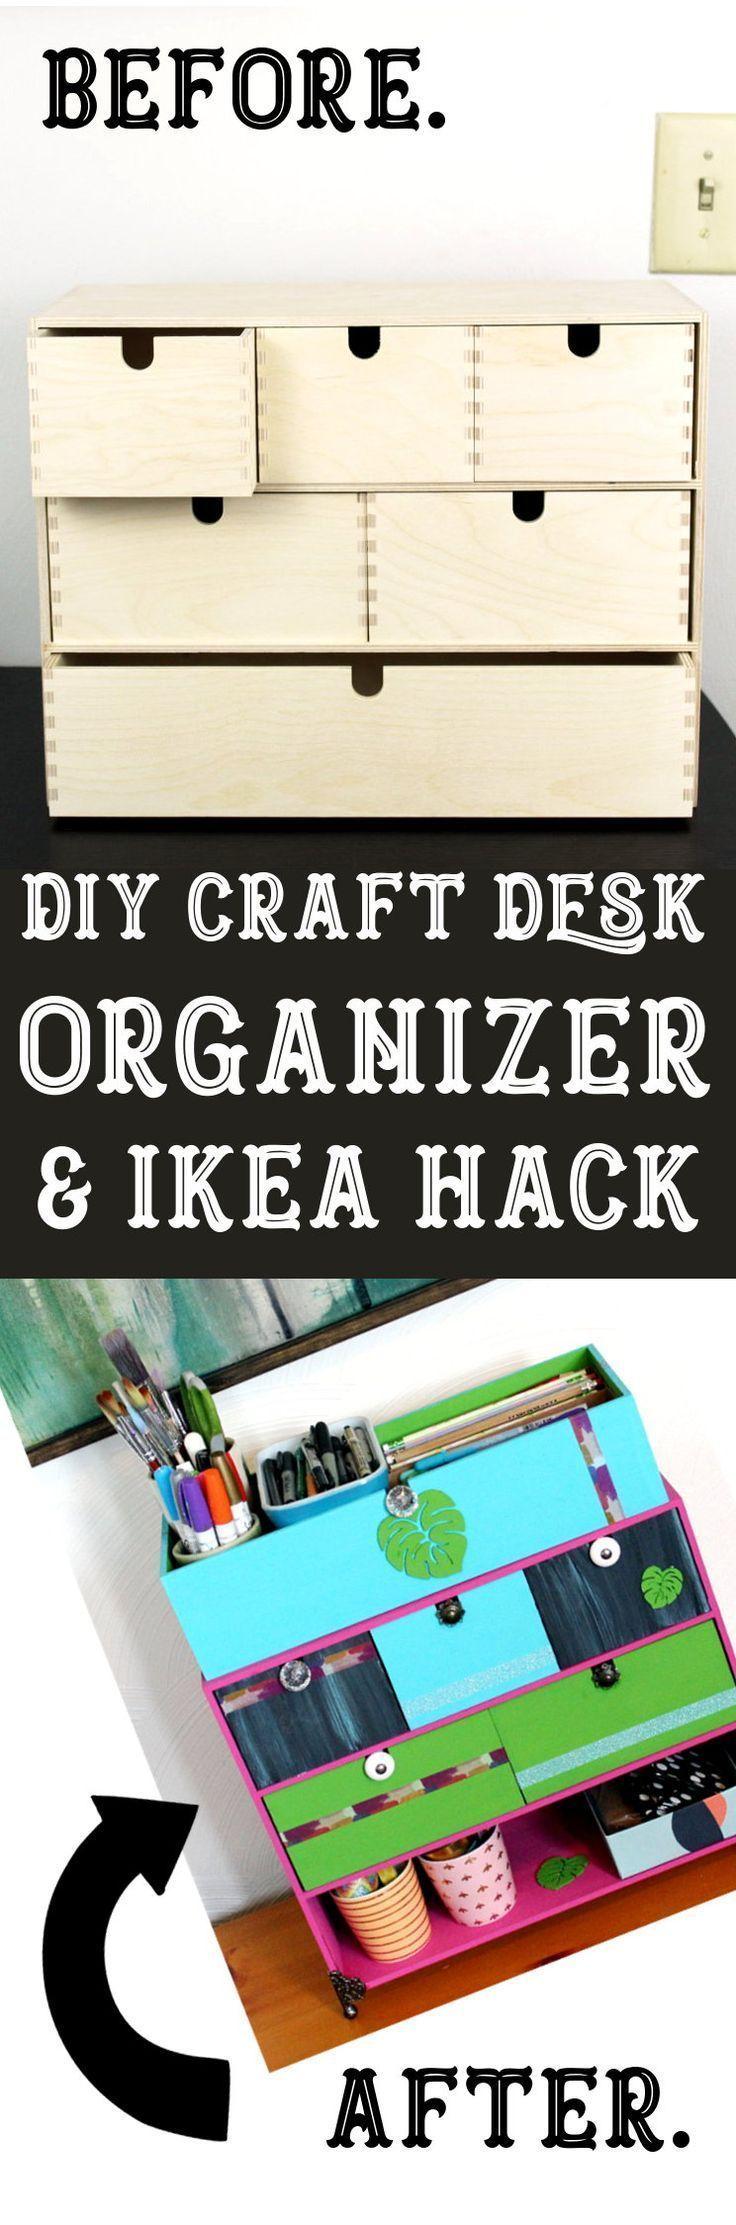 Diy Crafts Desk Organizer Ikea Hack Soap Deli News Diy Crafts Desk Diy Office Organization Desk Organization Ikea